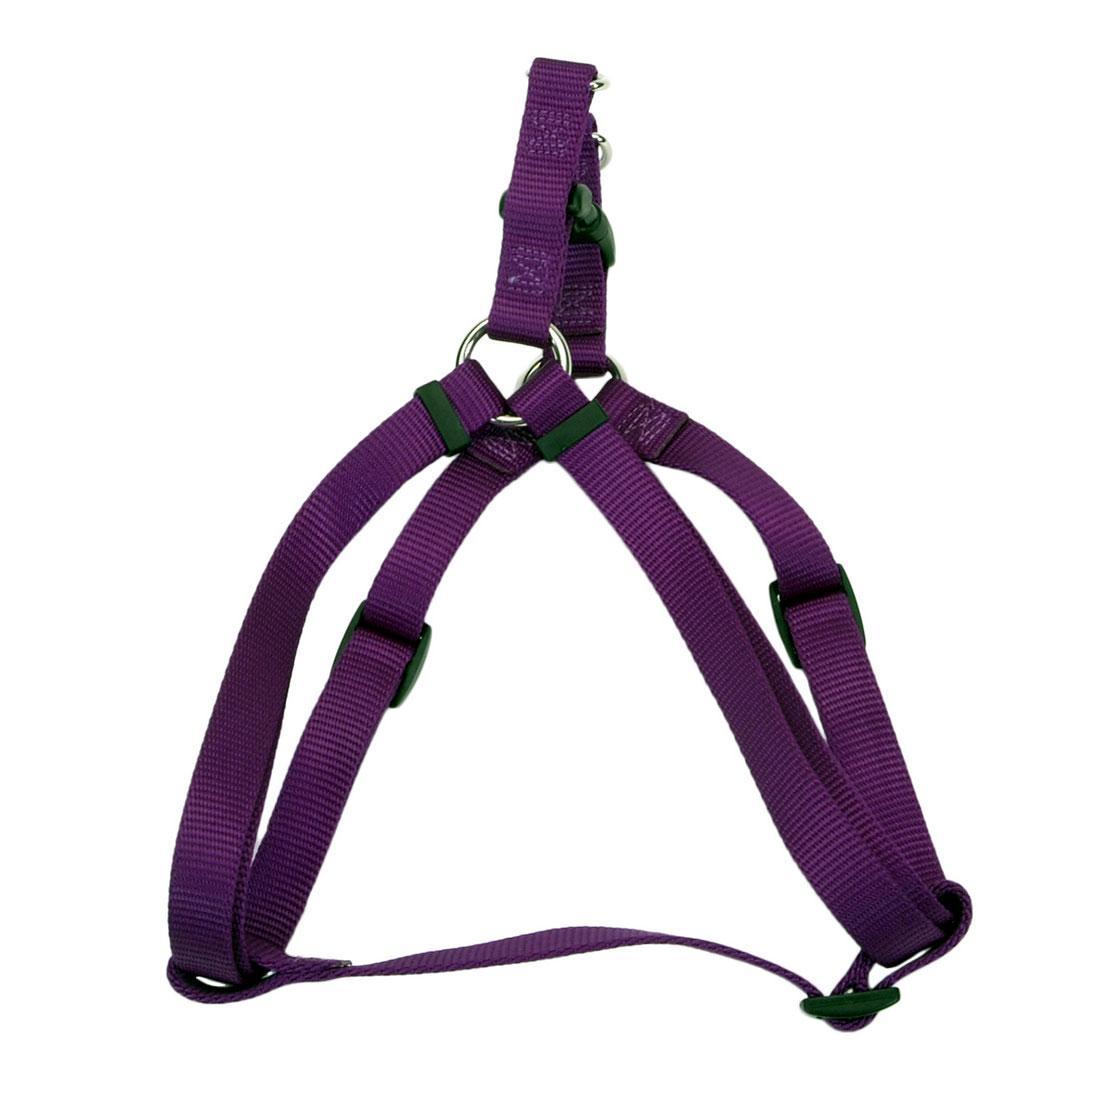 Coastal Comfort Wrap Adjustable Dog Harness, Purple Image